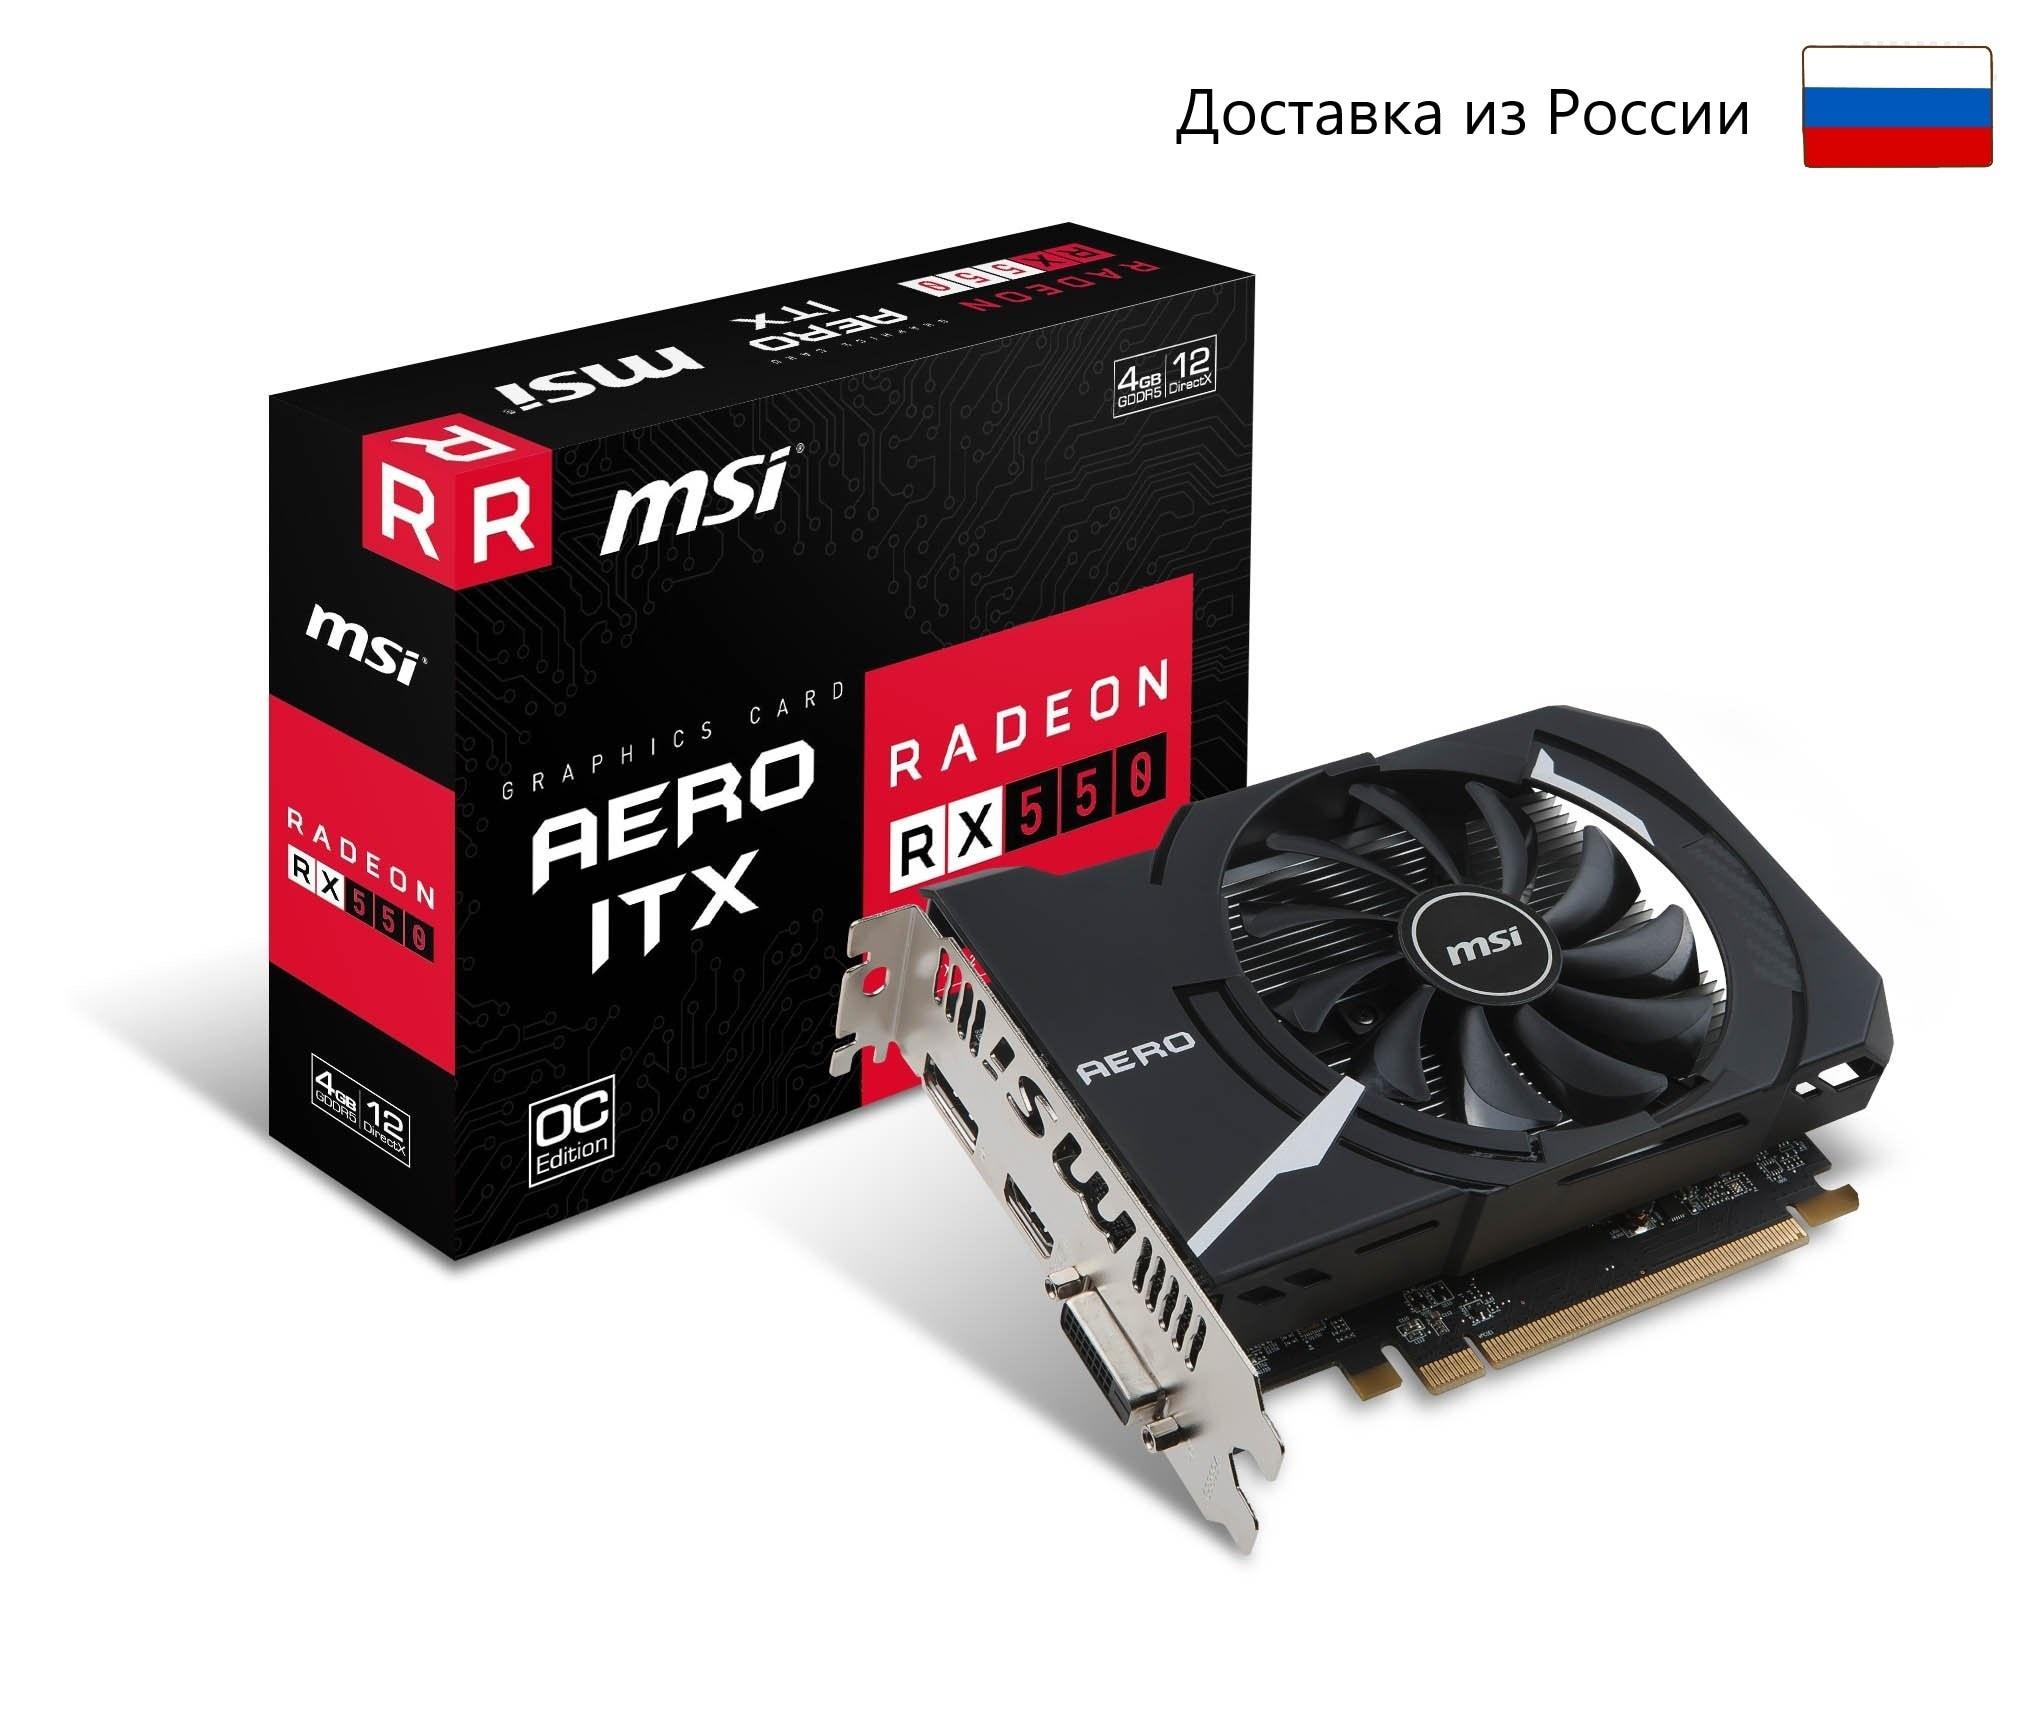 Video Card MSI Radeon RX 550 2 GB AERO ITX OC Edition